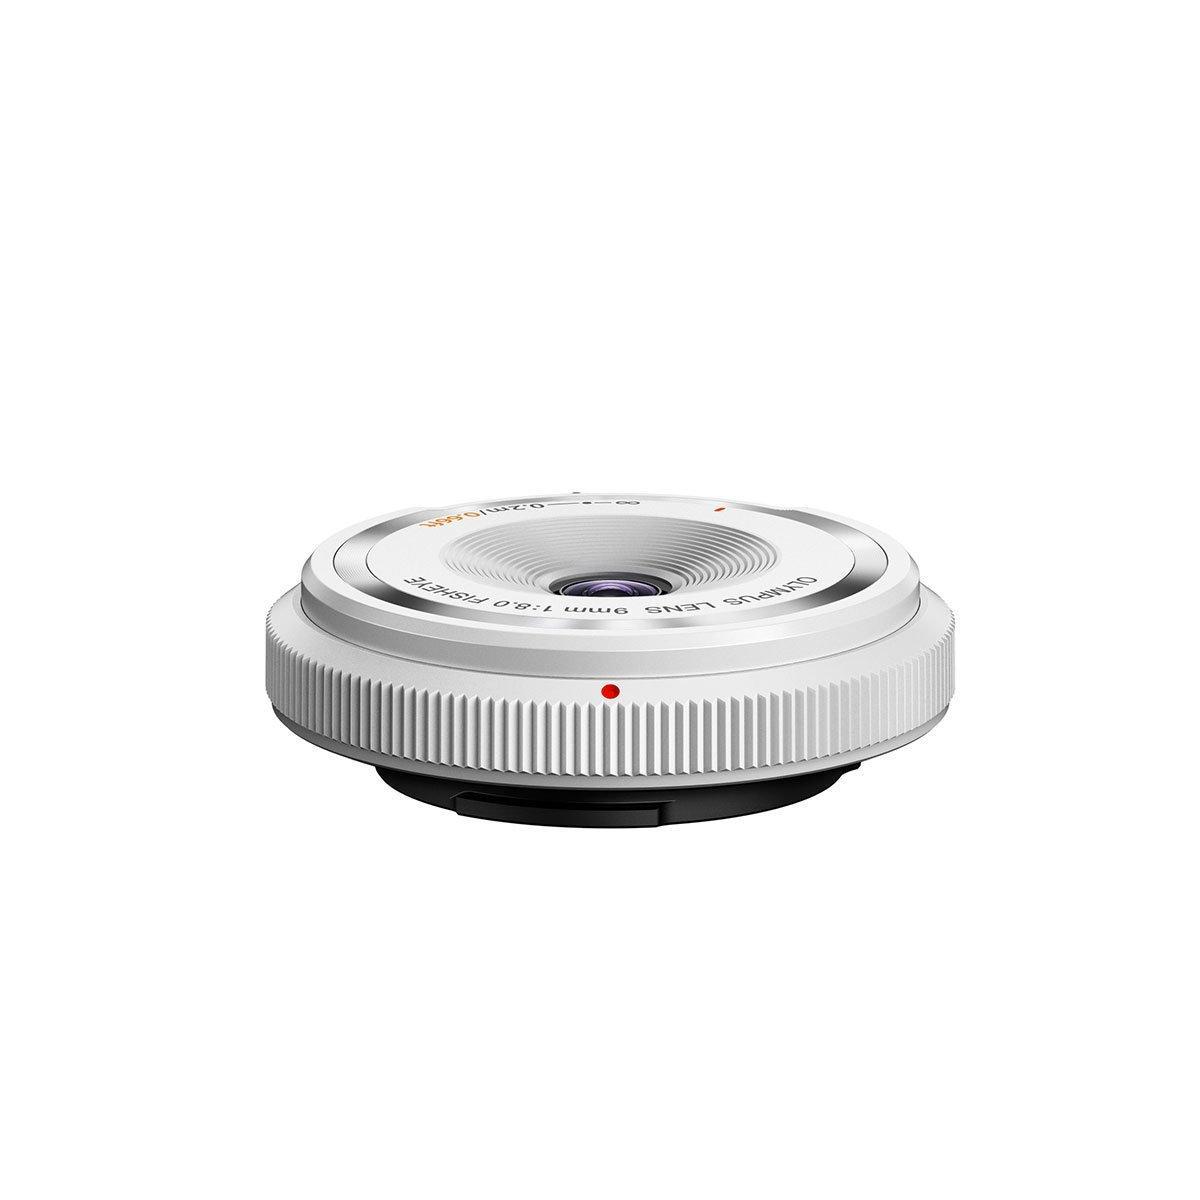 Olympus Body cap lens 9mm f/8 fisheye valkoinen